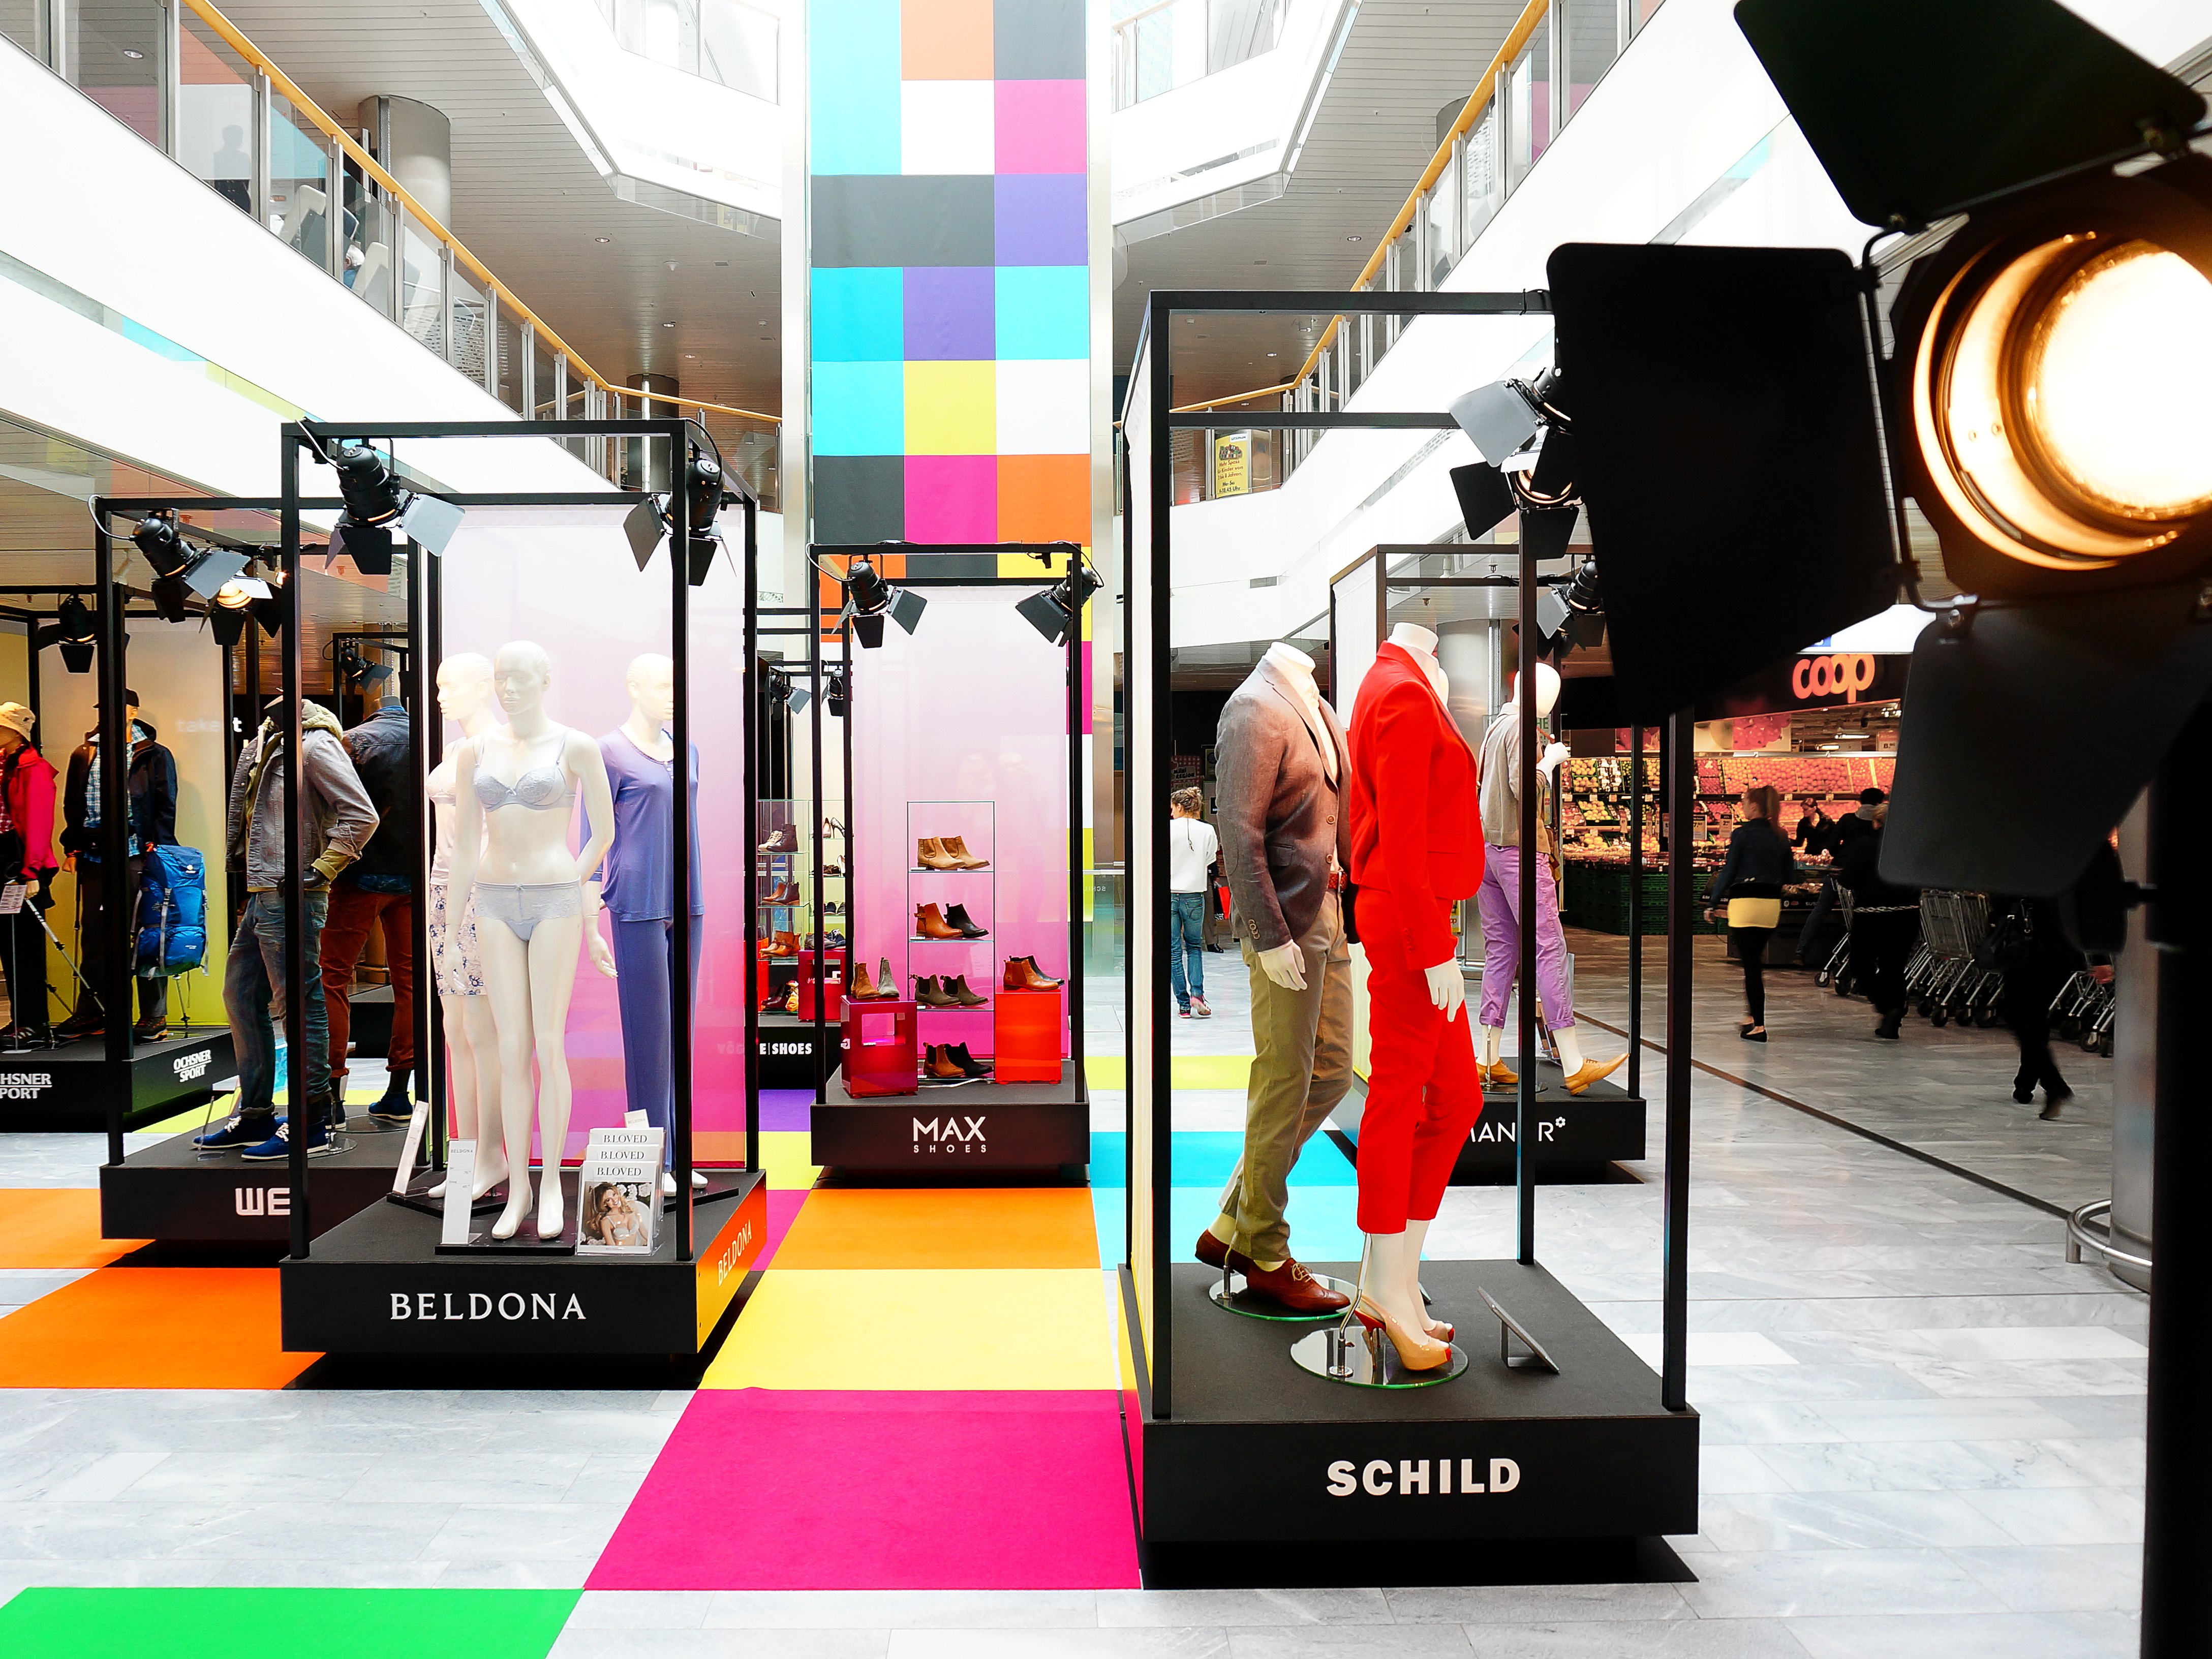 Coop EKZ Letzipark Fashionshow